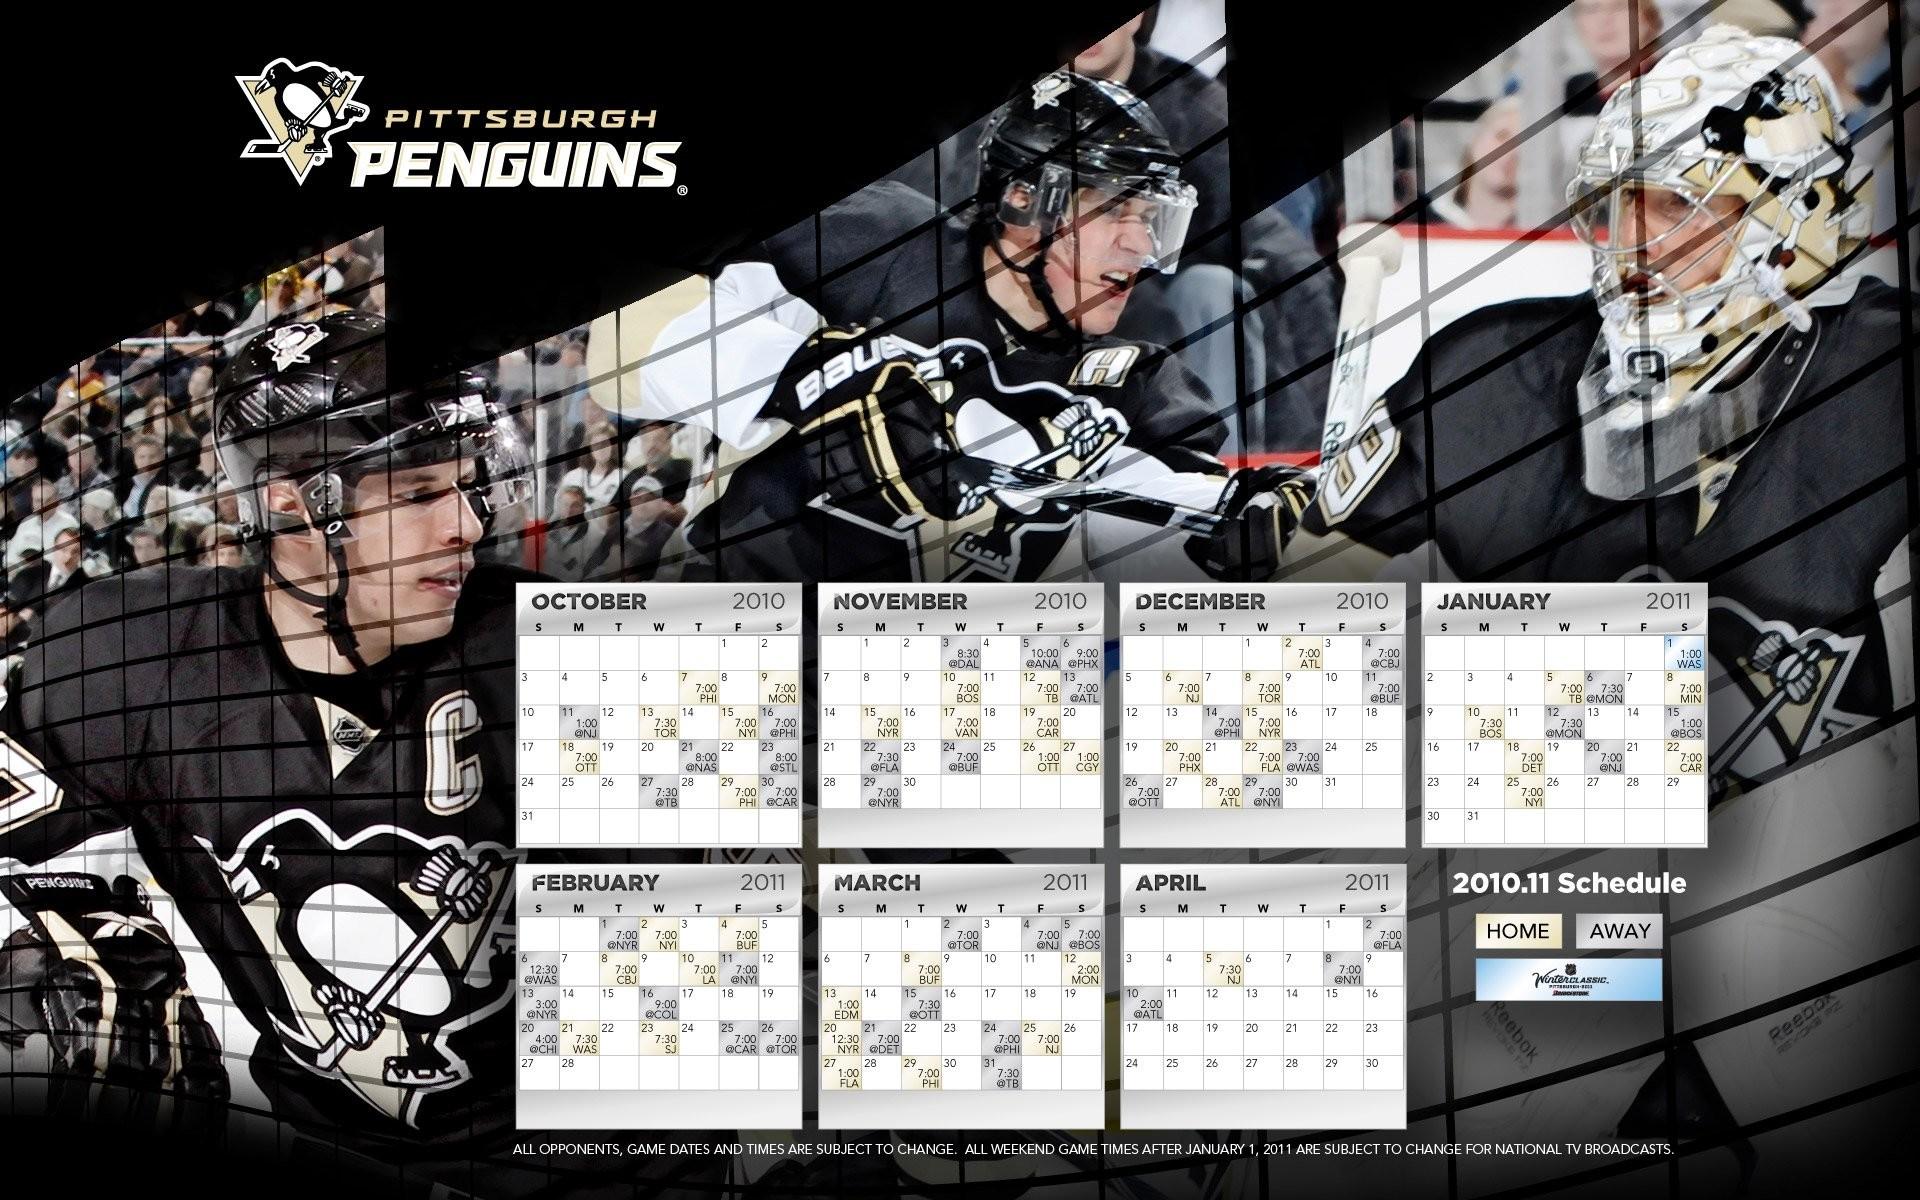 Pittsburgh Penguins Schedule